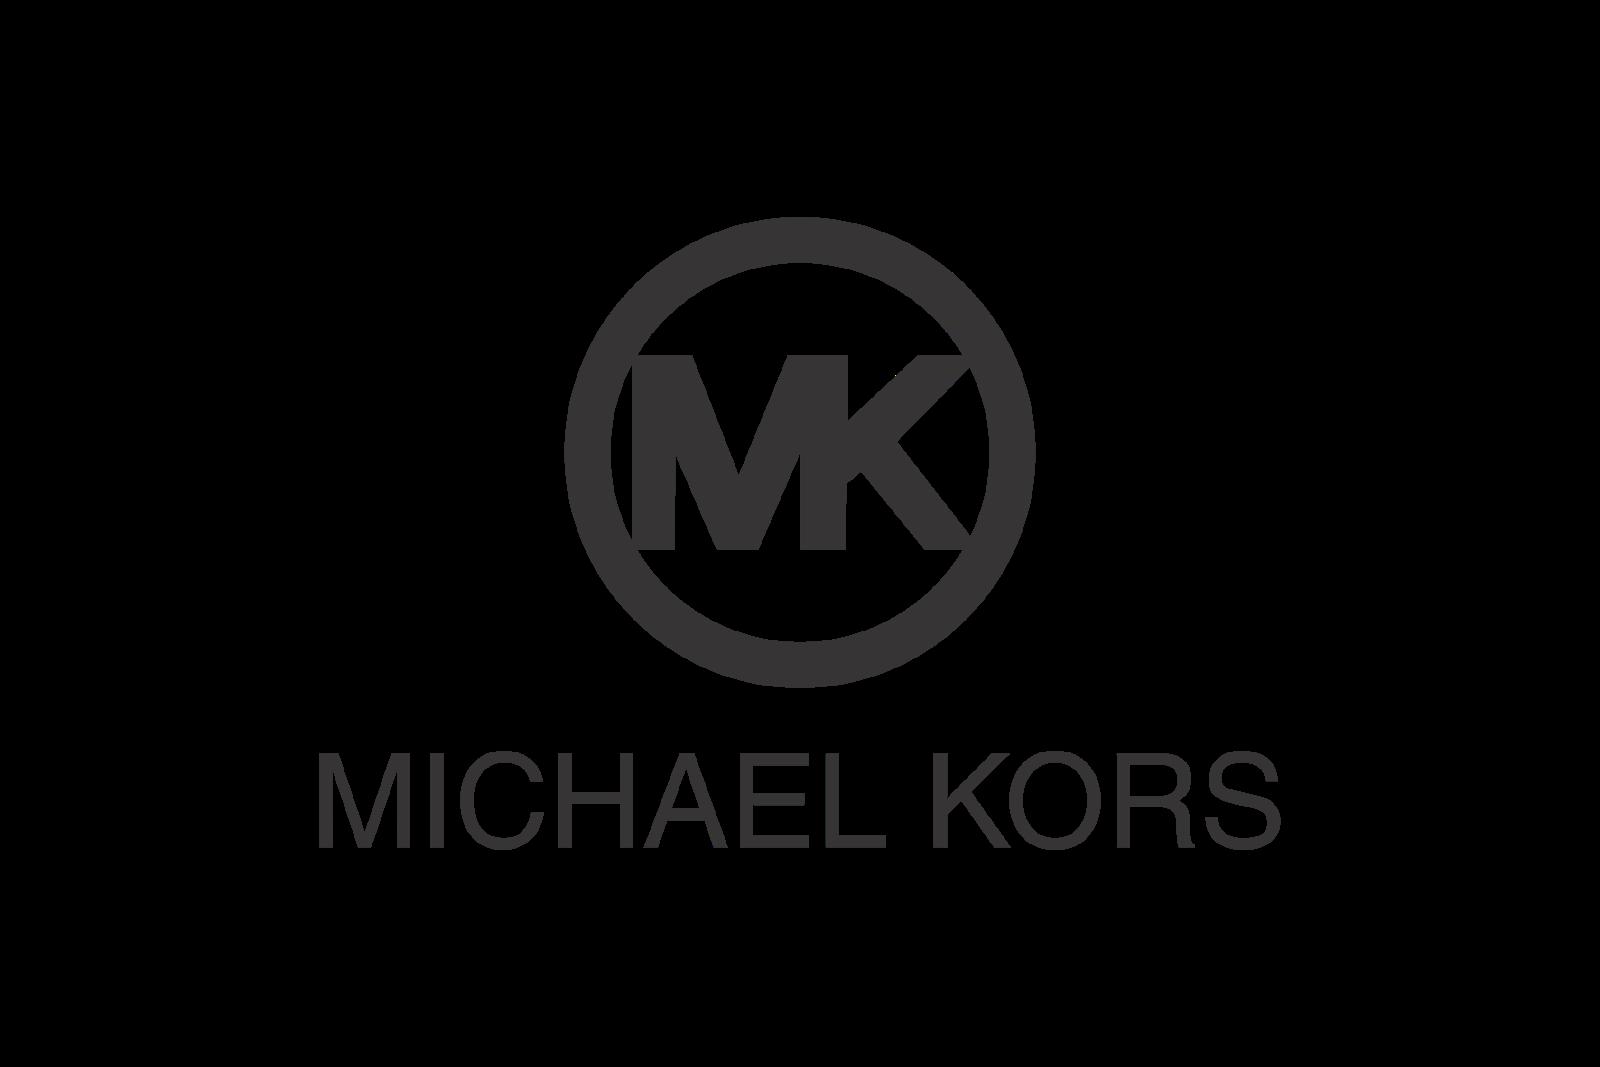 Logo-Michael_Kors.png